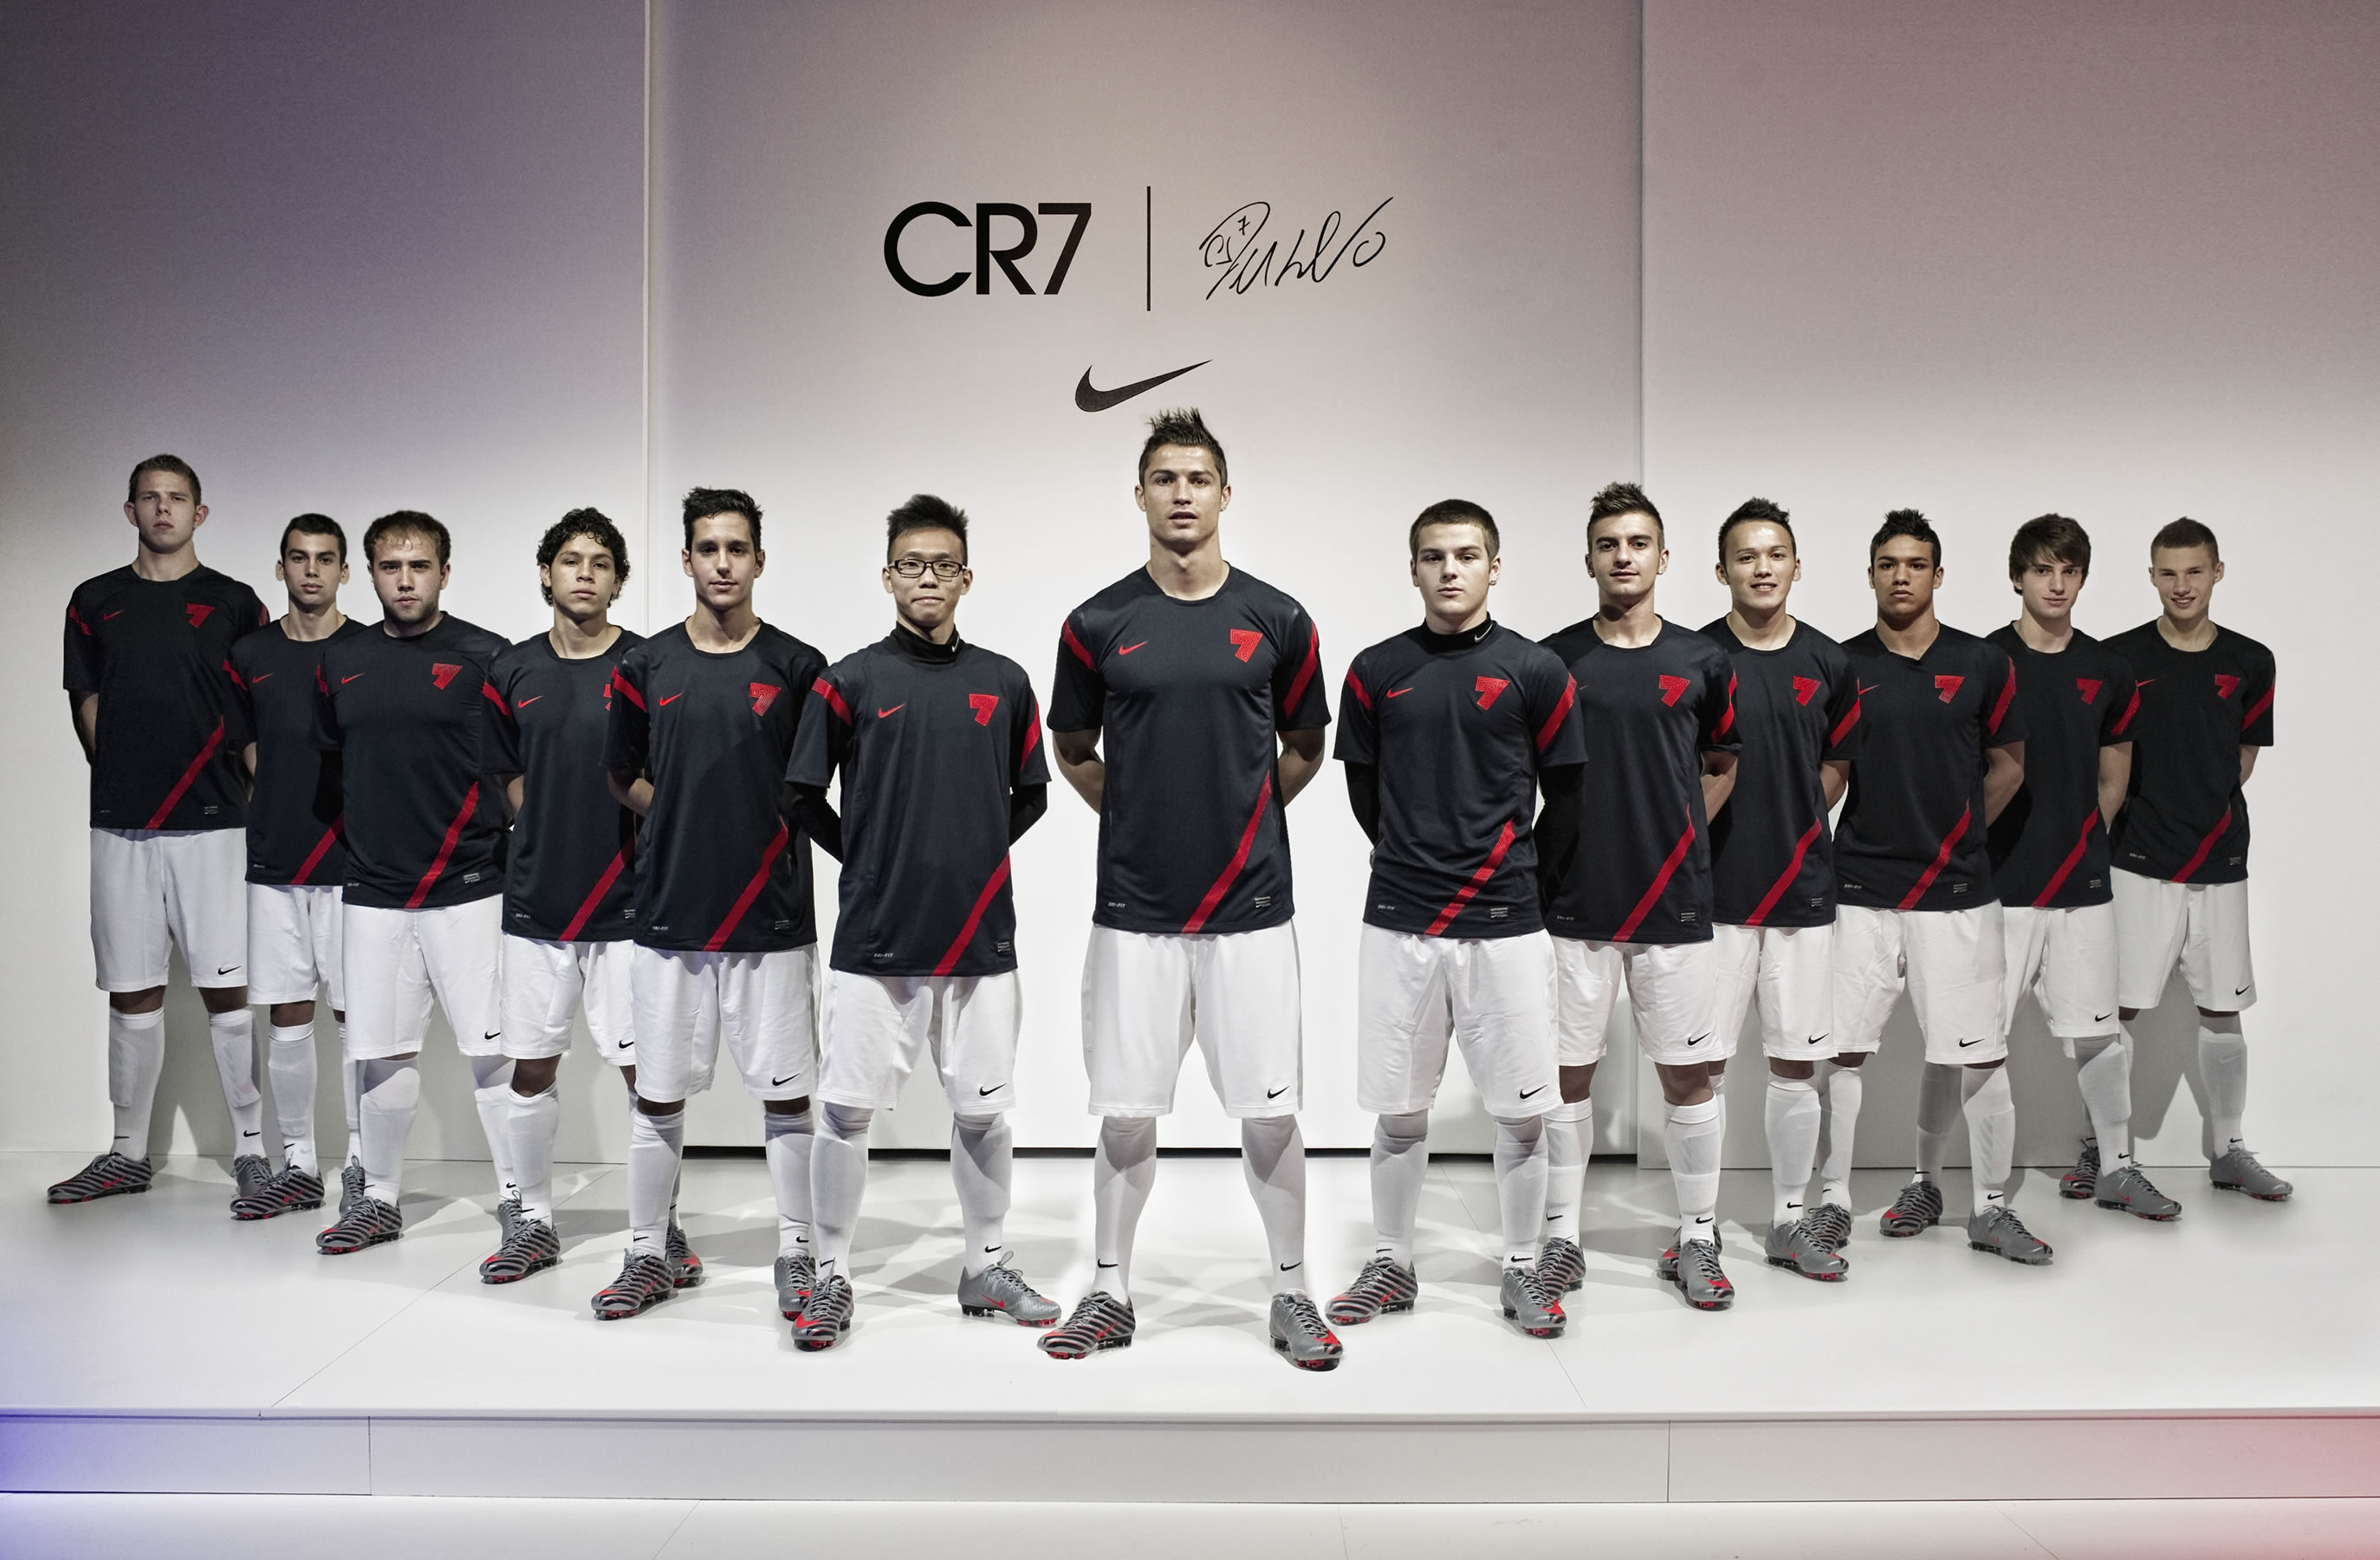 CR7 Nike Workout Squad Wallpaper   Cristiano Ronaldo 2747x1800